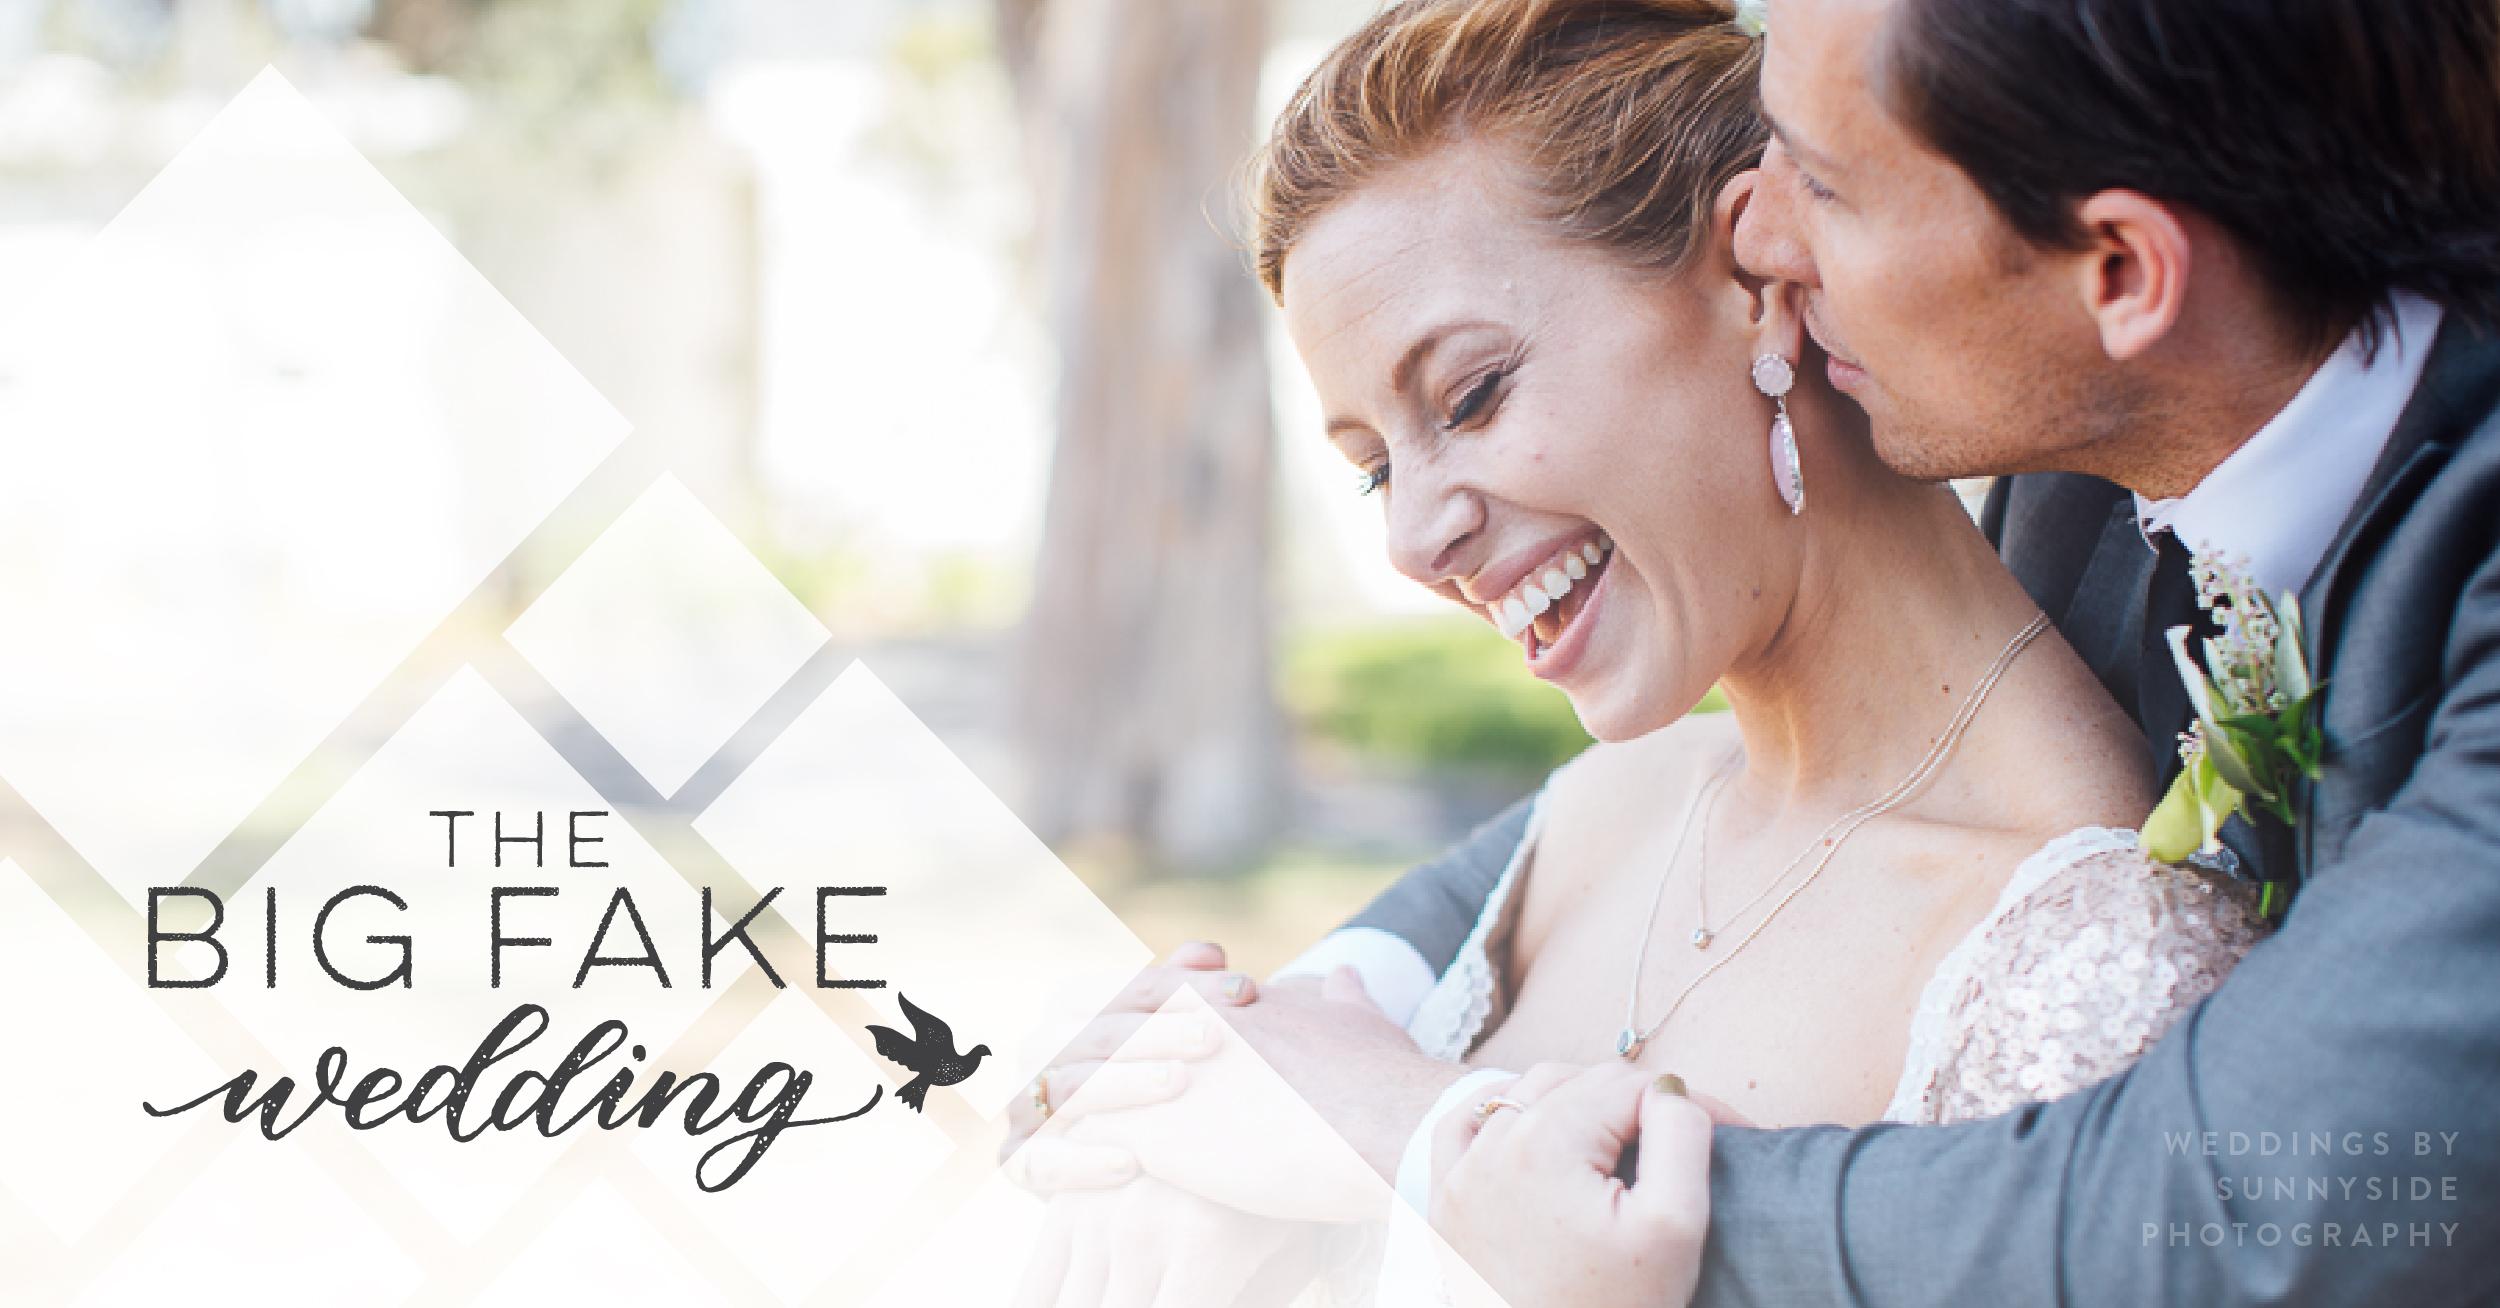 Big Fake Wedding 2018 Ticket Giveaway